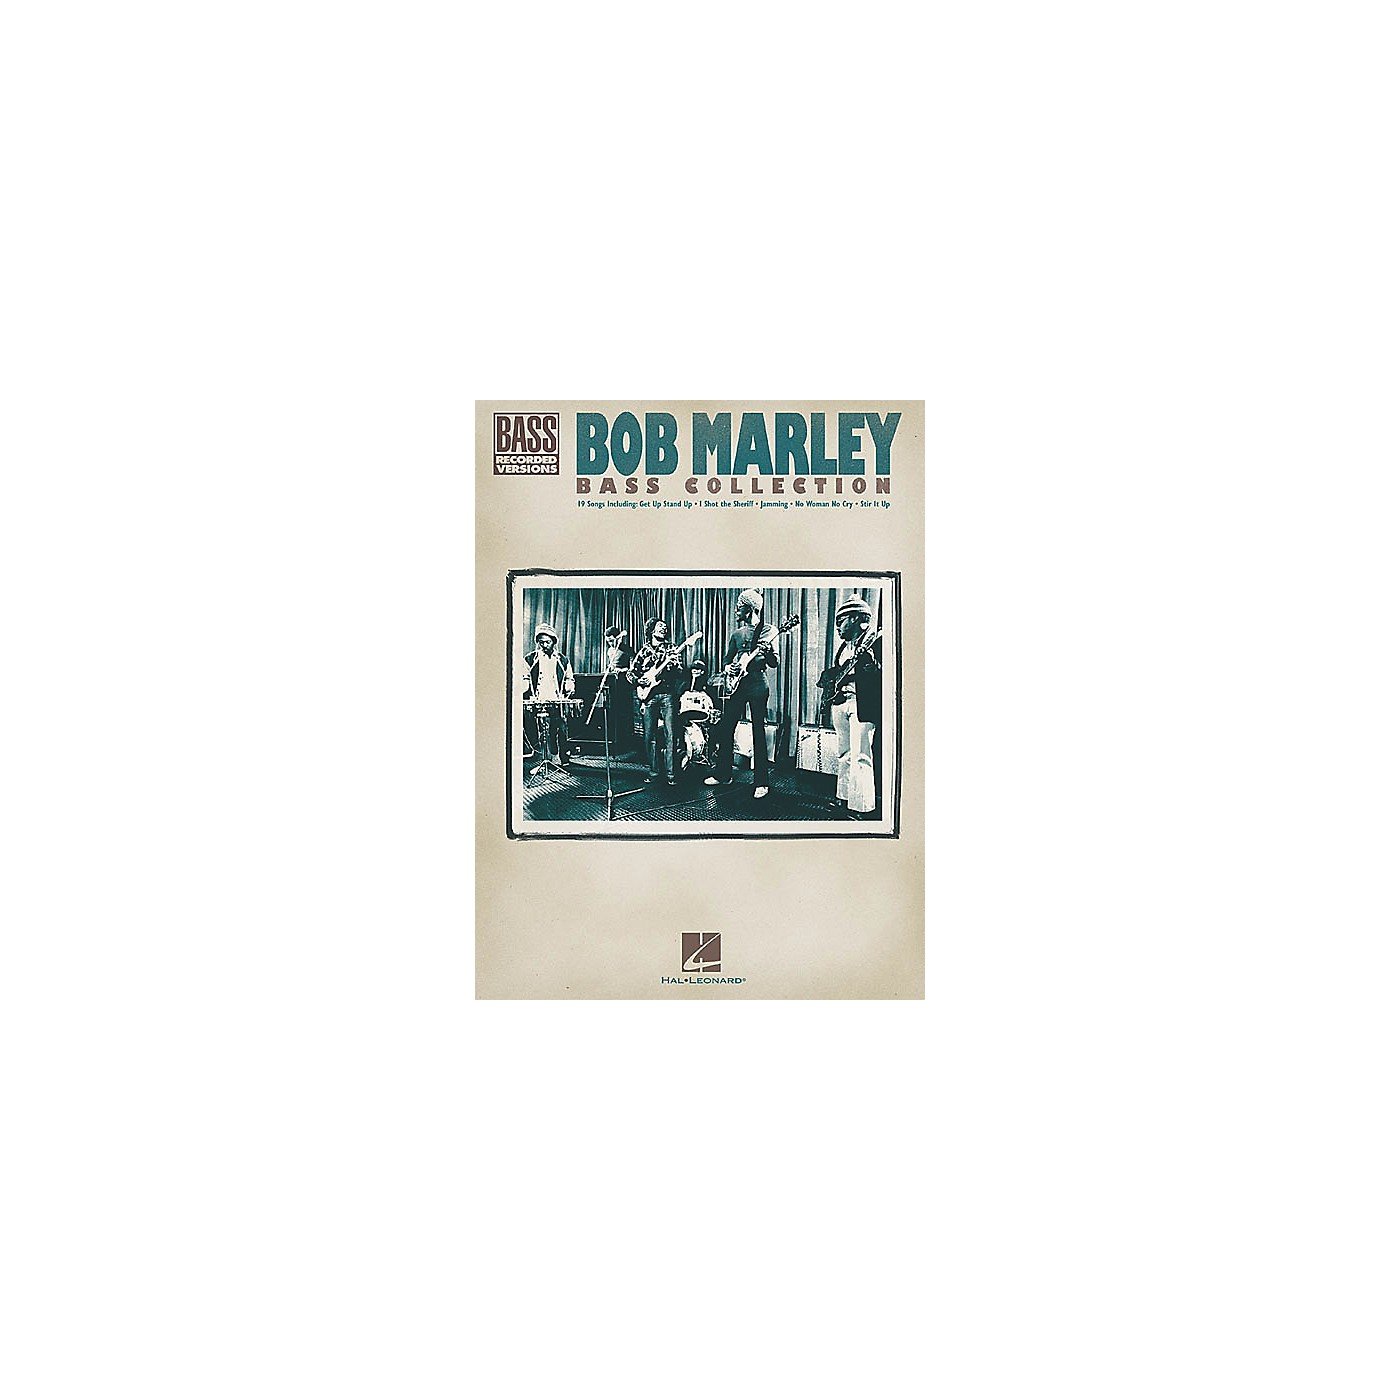 Hal Leonard Bob Marley Collection Bass Guitar Tab Songbook thumbnail